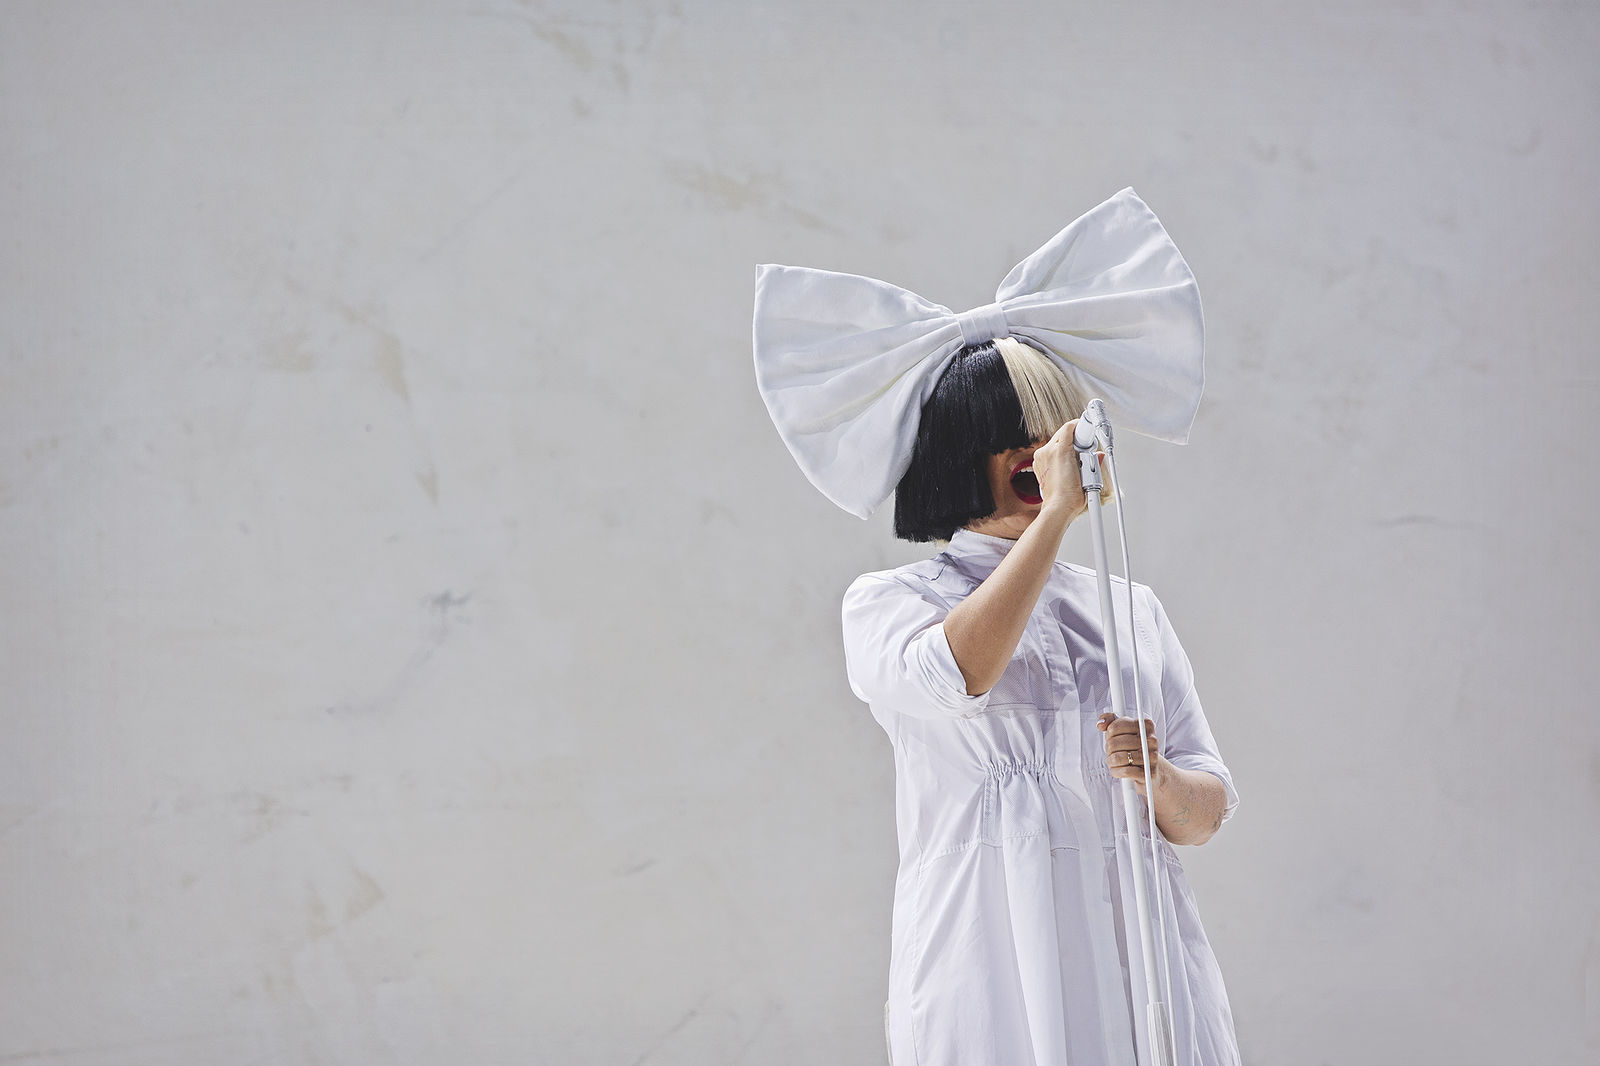 V Festival 2016 - SIA - Bianca Barrett